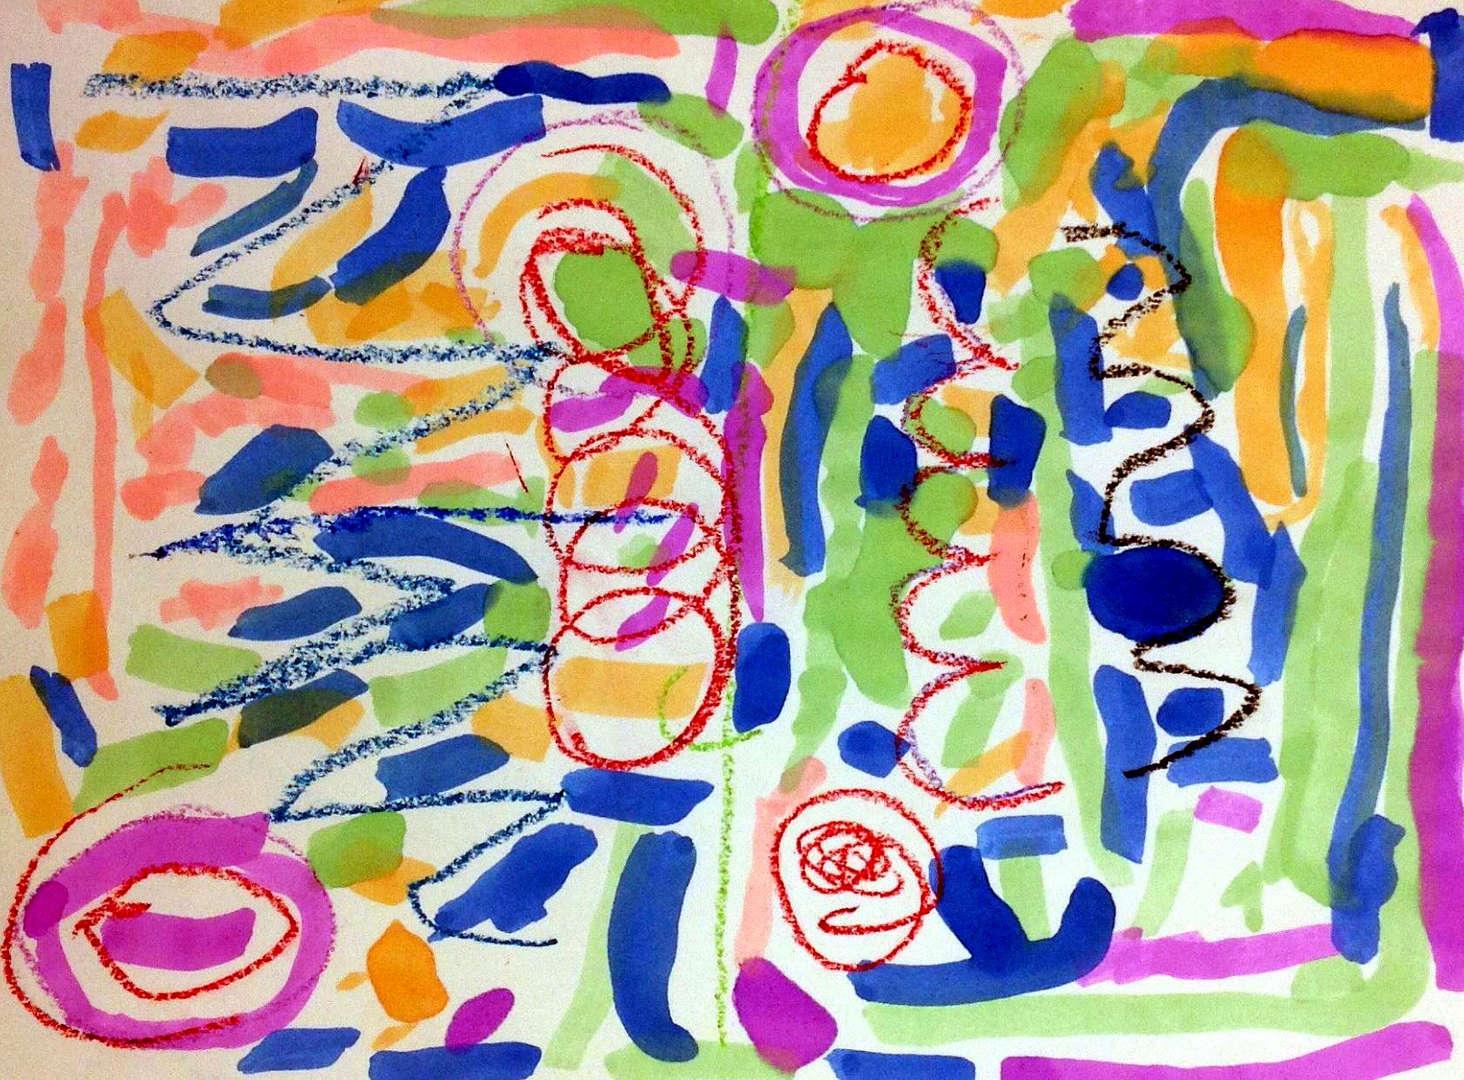 Geometric artwork colorful